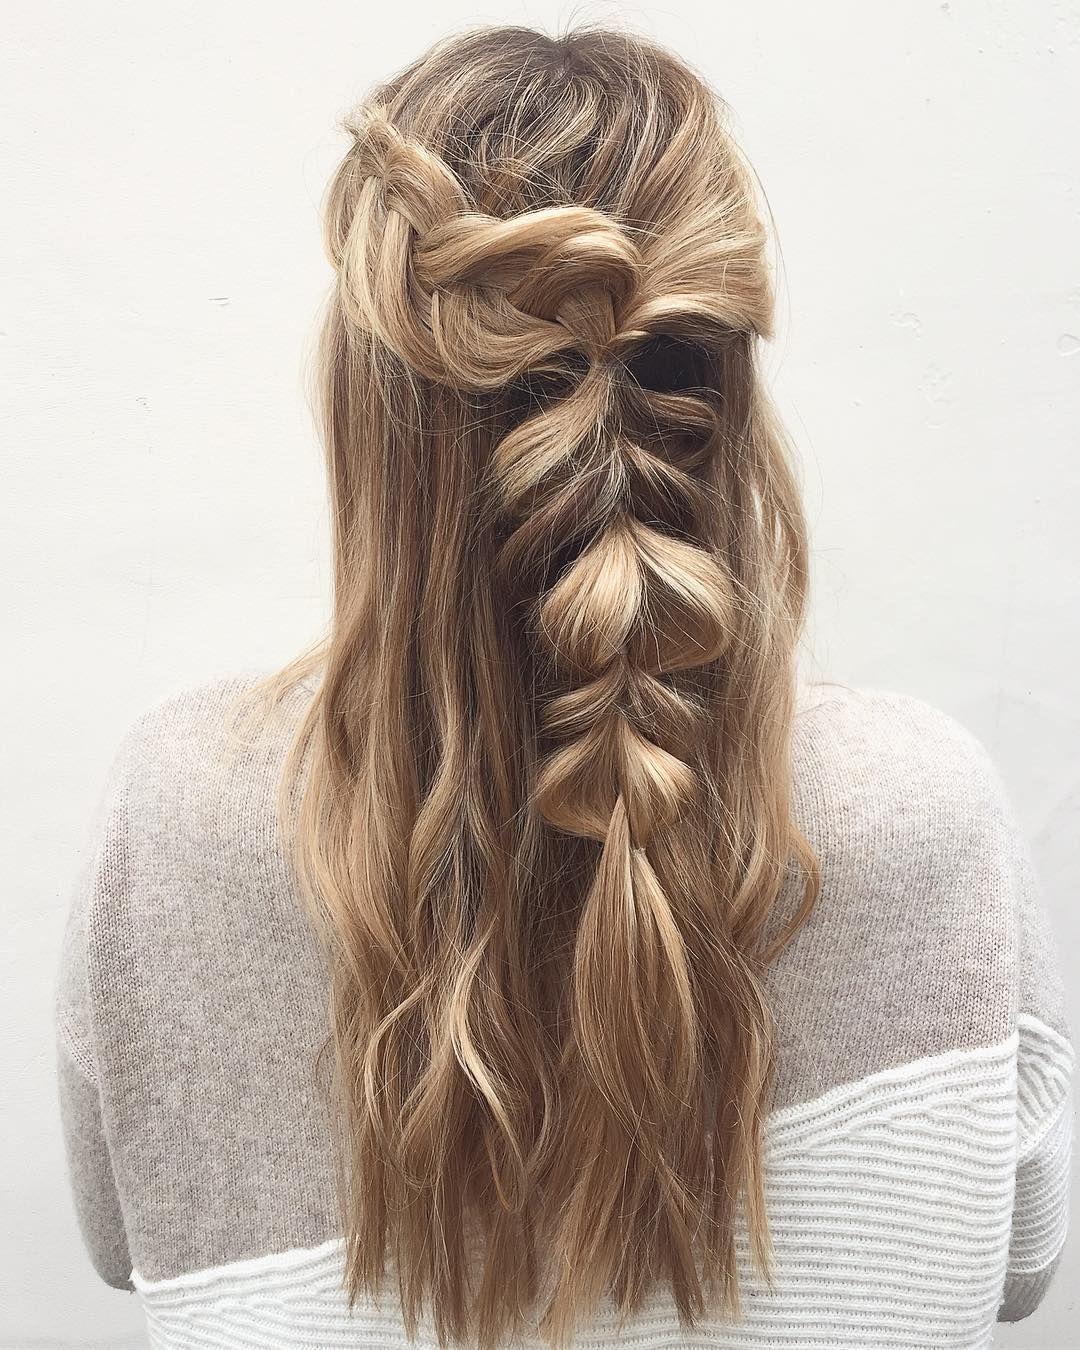 boho braid : Featured hairstyle inspiration - Michael Gray Hair #hairstyle #braids #hair #weddinghairstyle #Hairstyle #Braid #BraidIdeas #BraidInspo #BraidedHair #Braidstyles